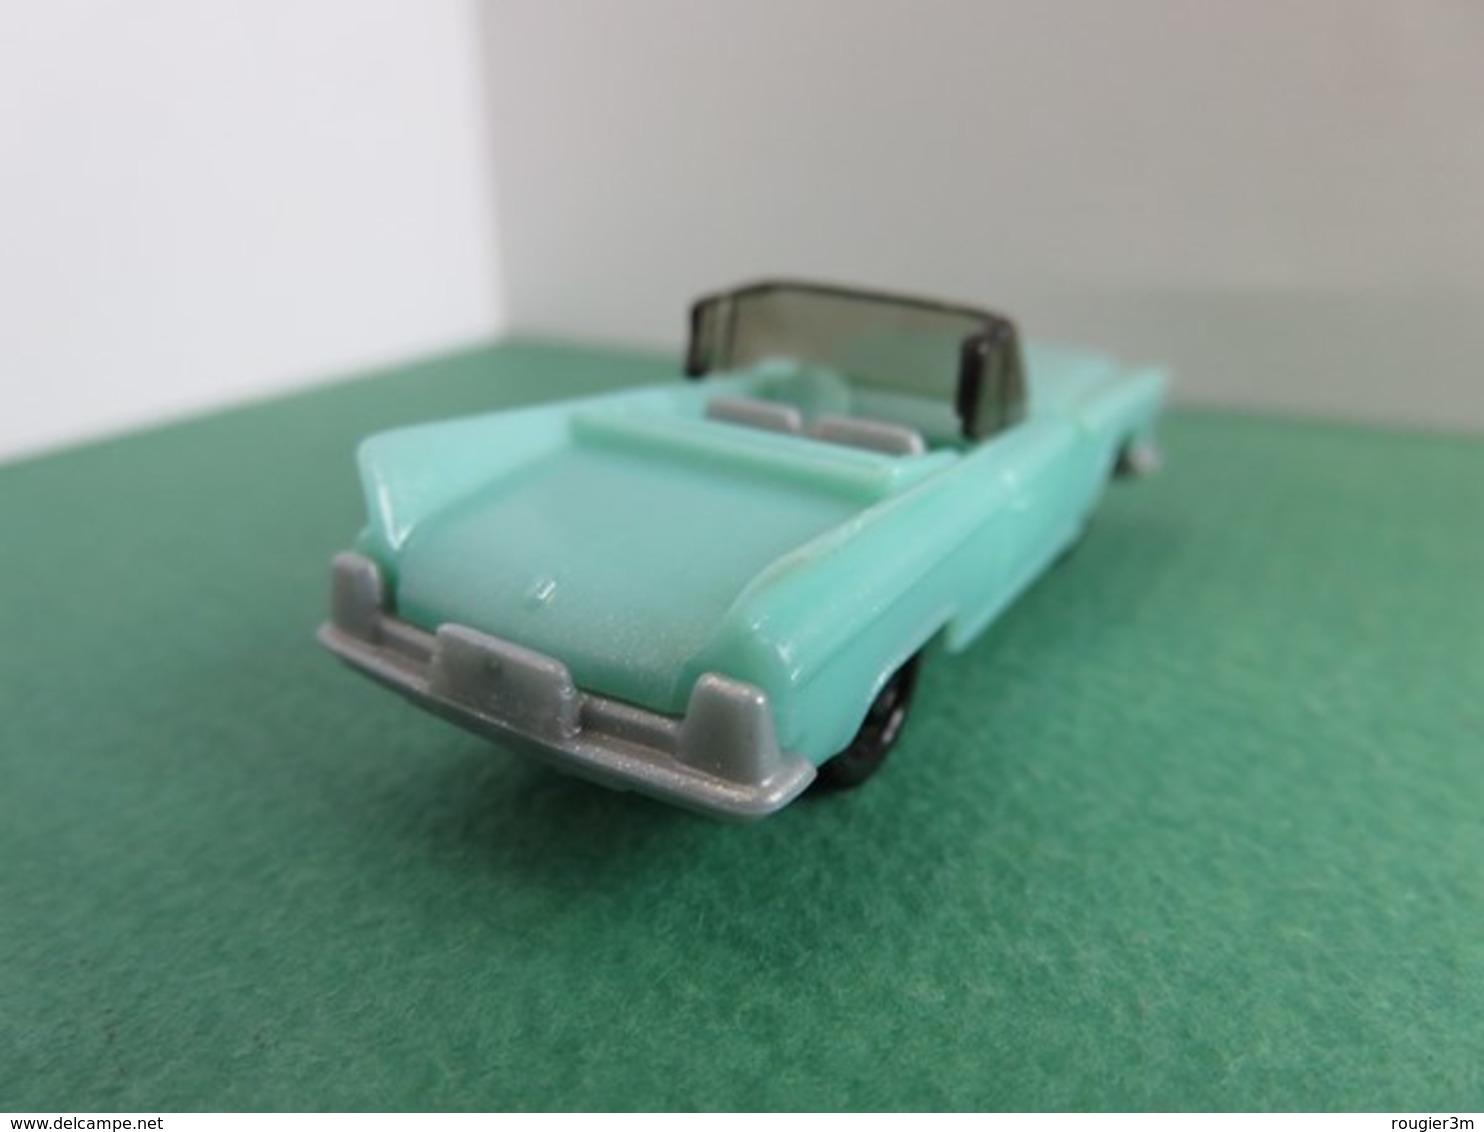 167 - Figurine - Miniature Voiture Américaine - Chevrolet Cabriolet - Kinder - Mountables